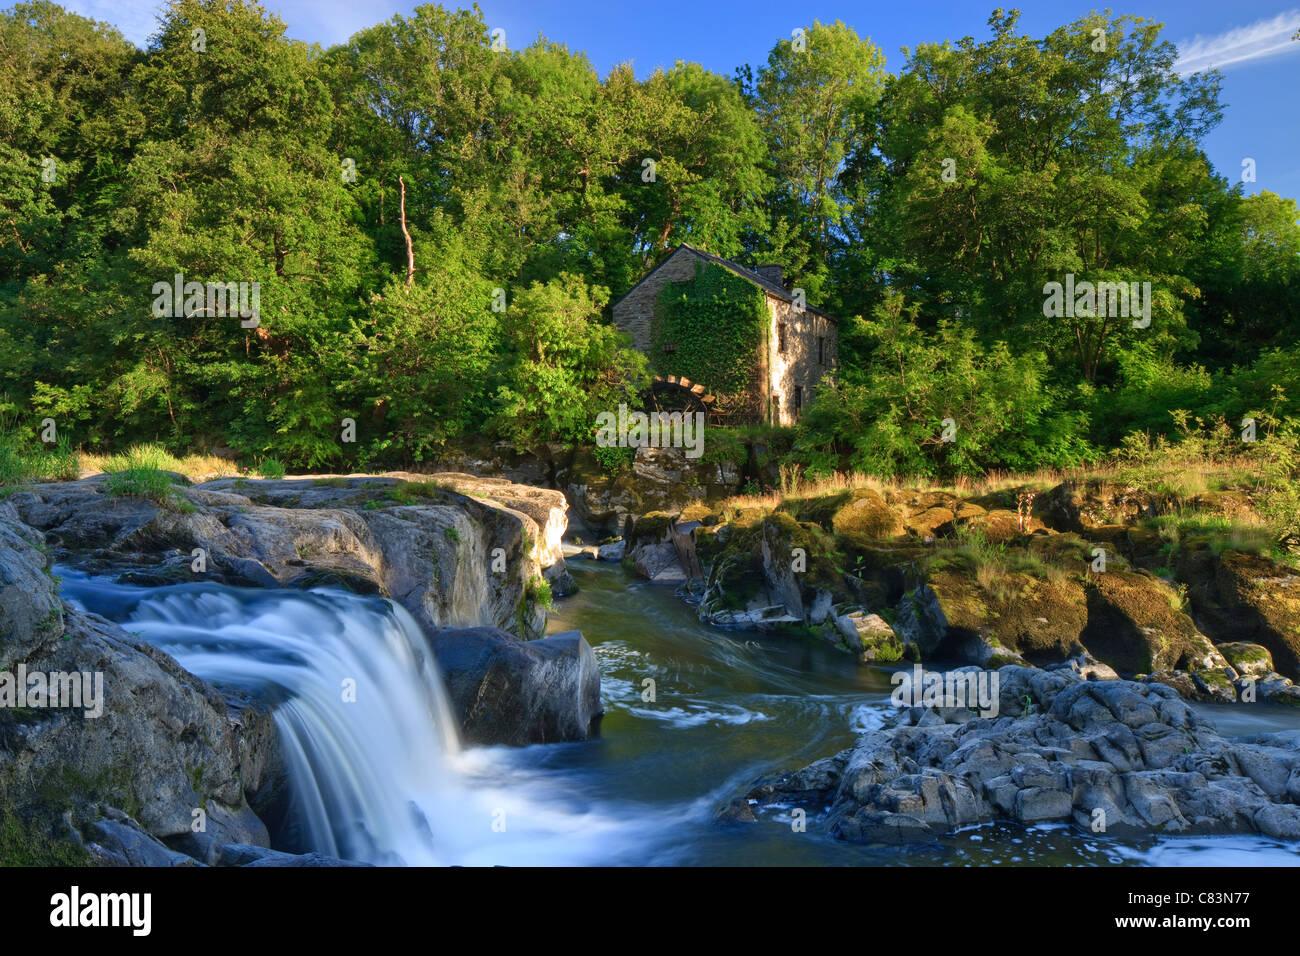 Cenarth Waterfalls Carmarthenshire Wales - Stock Image